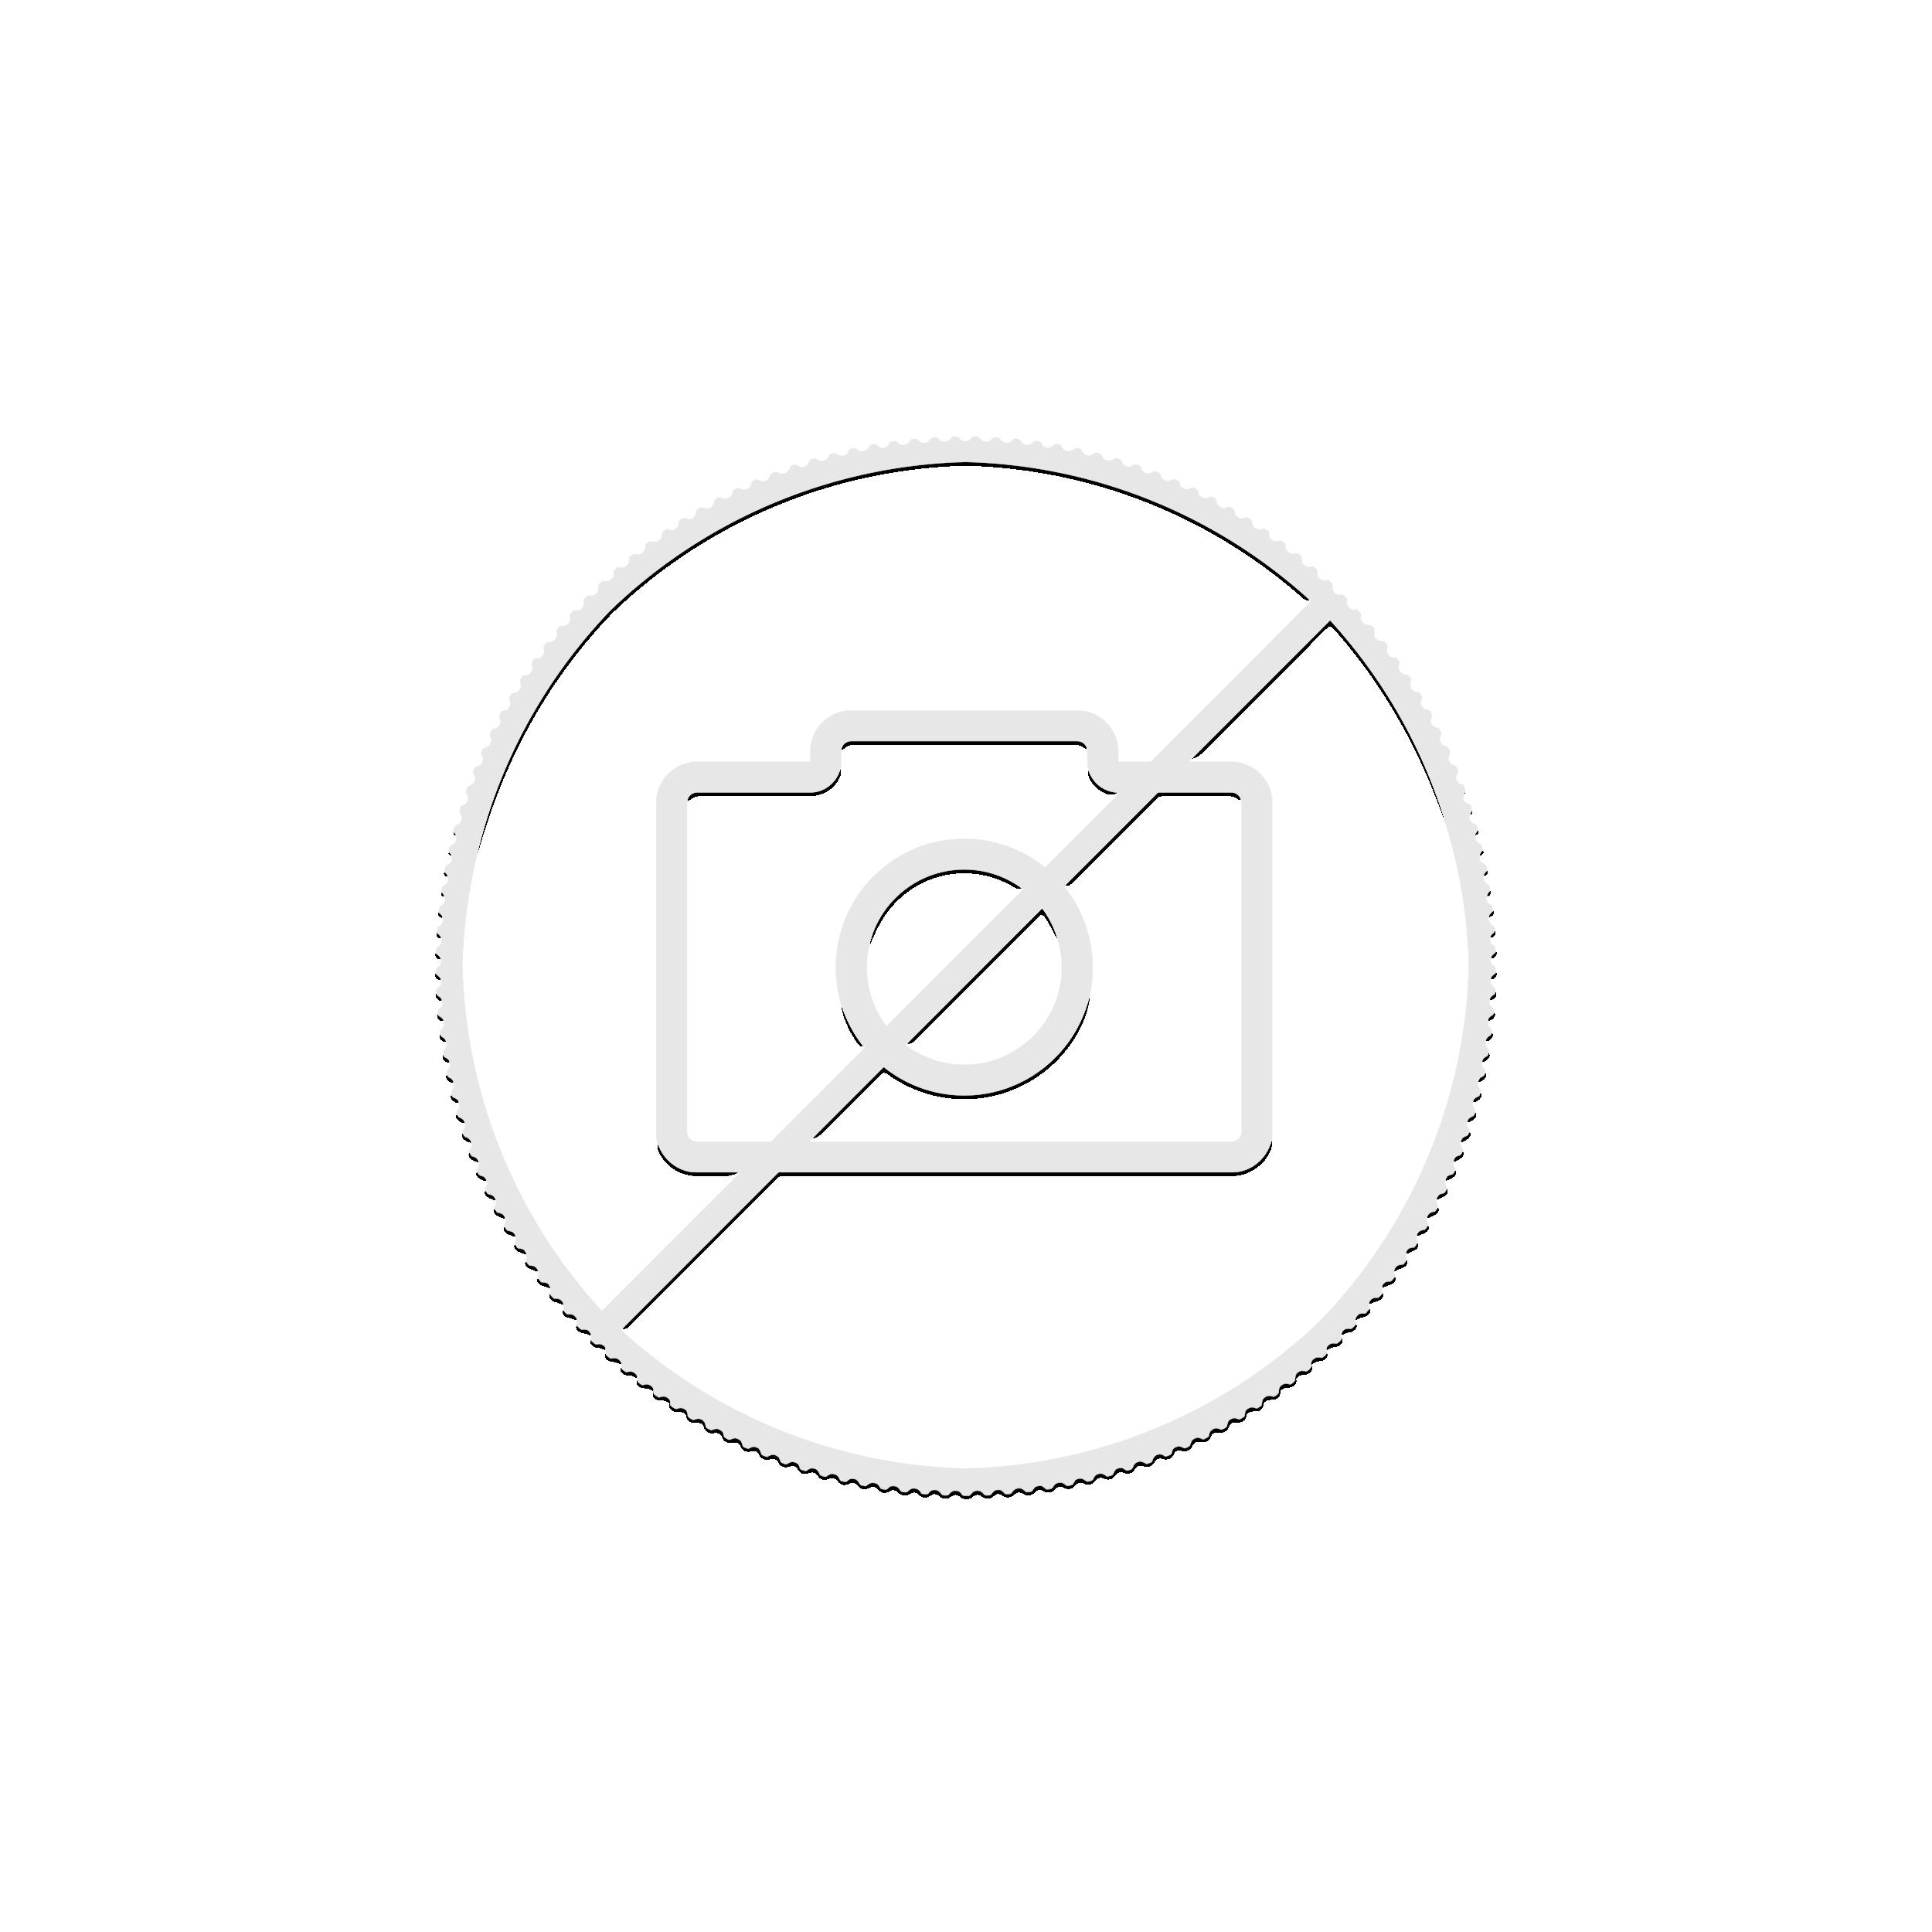 1/2 troy ounce gold Vienna Philharmonic